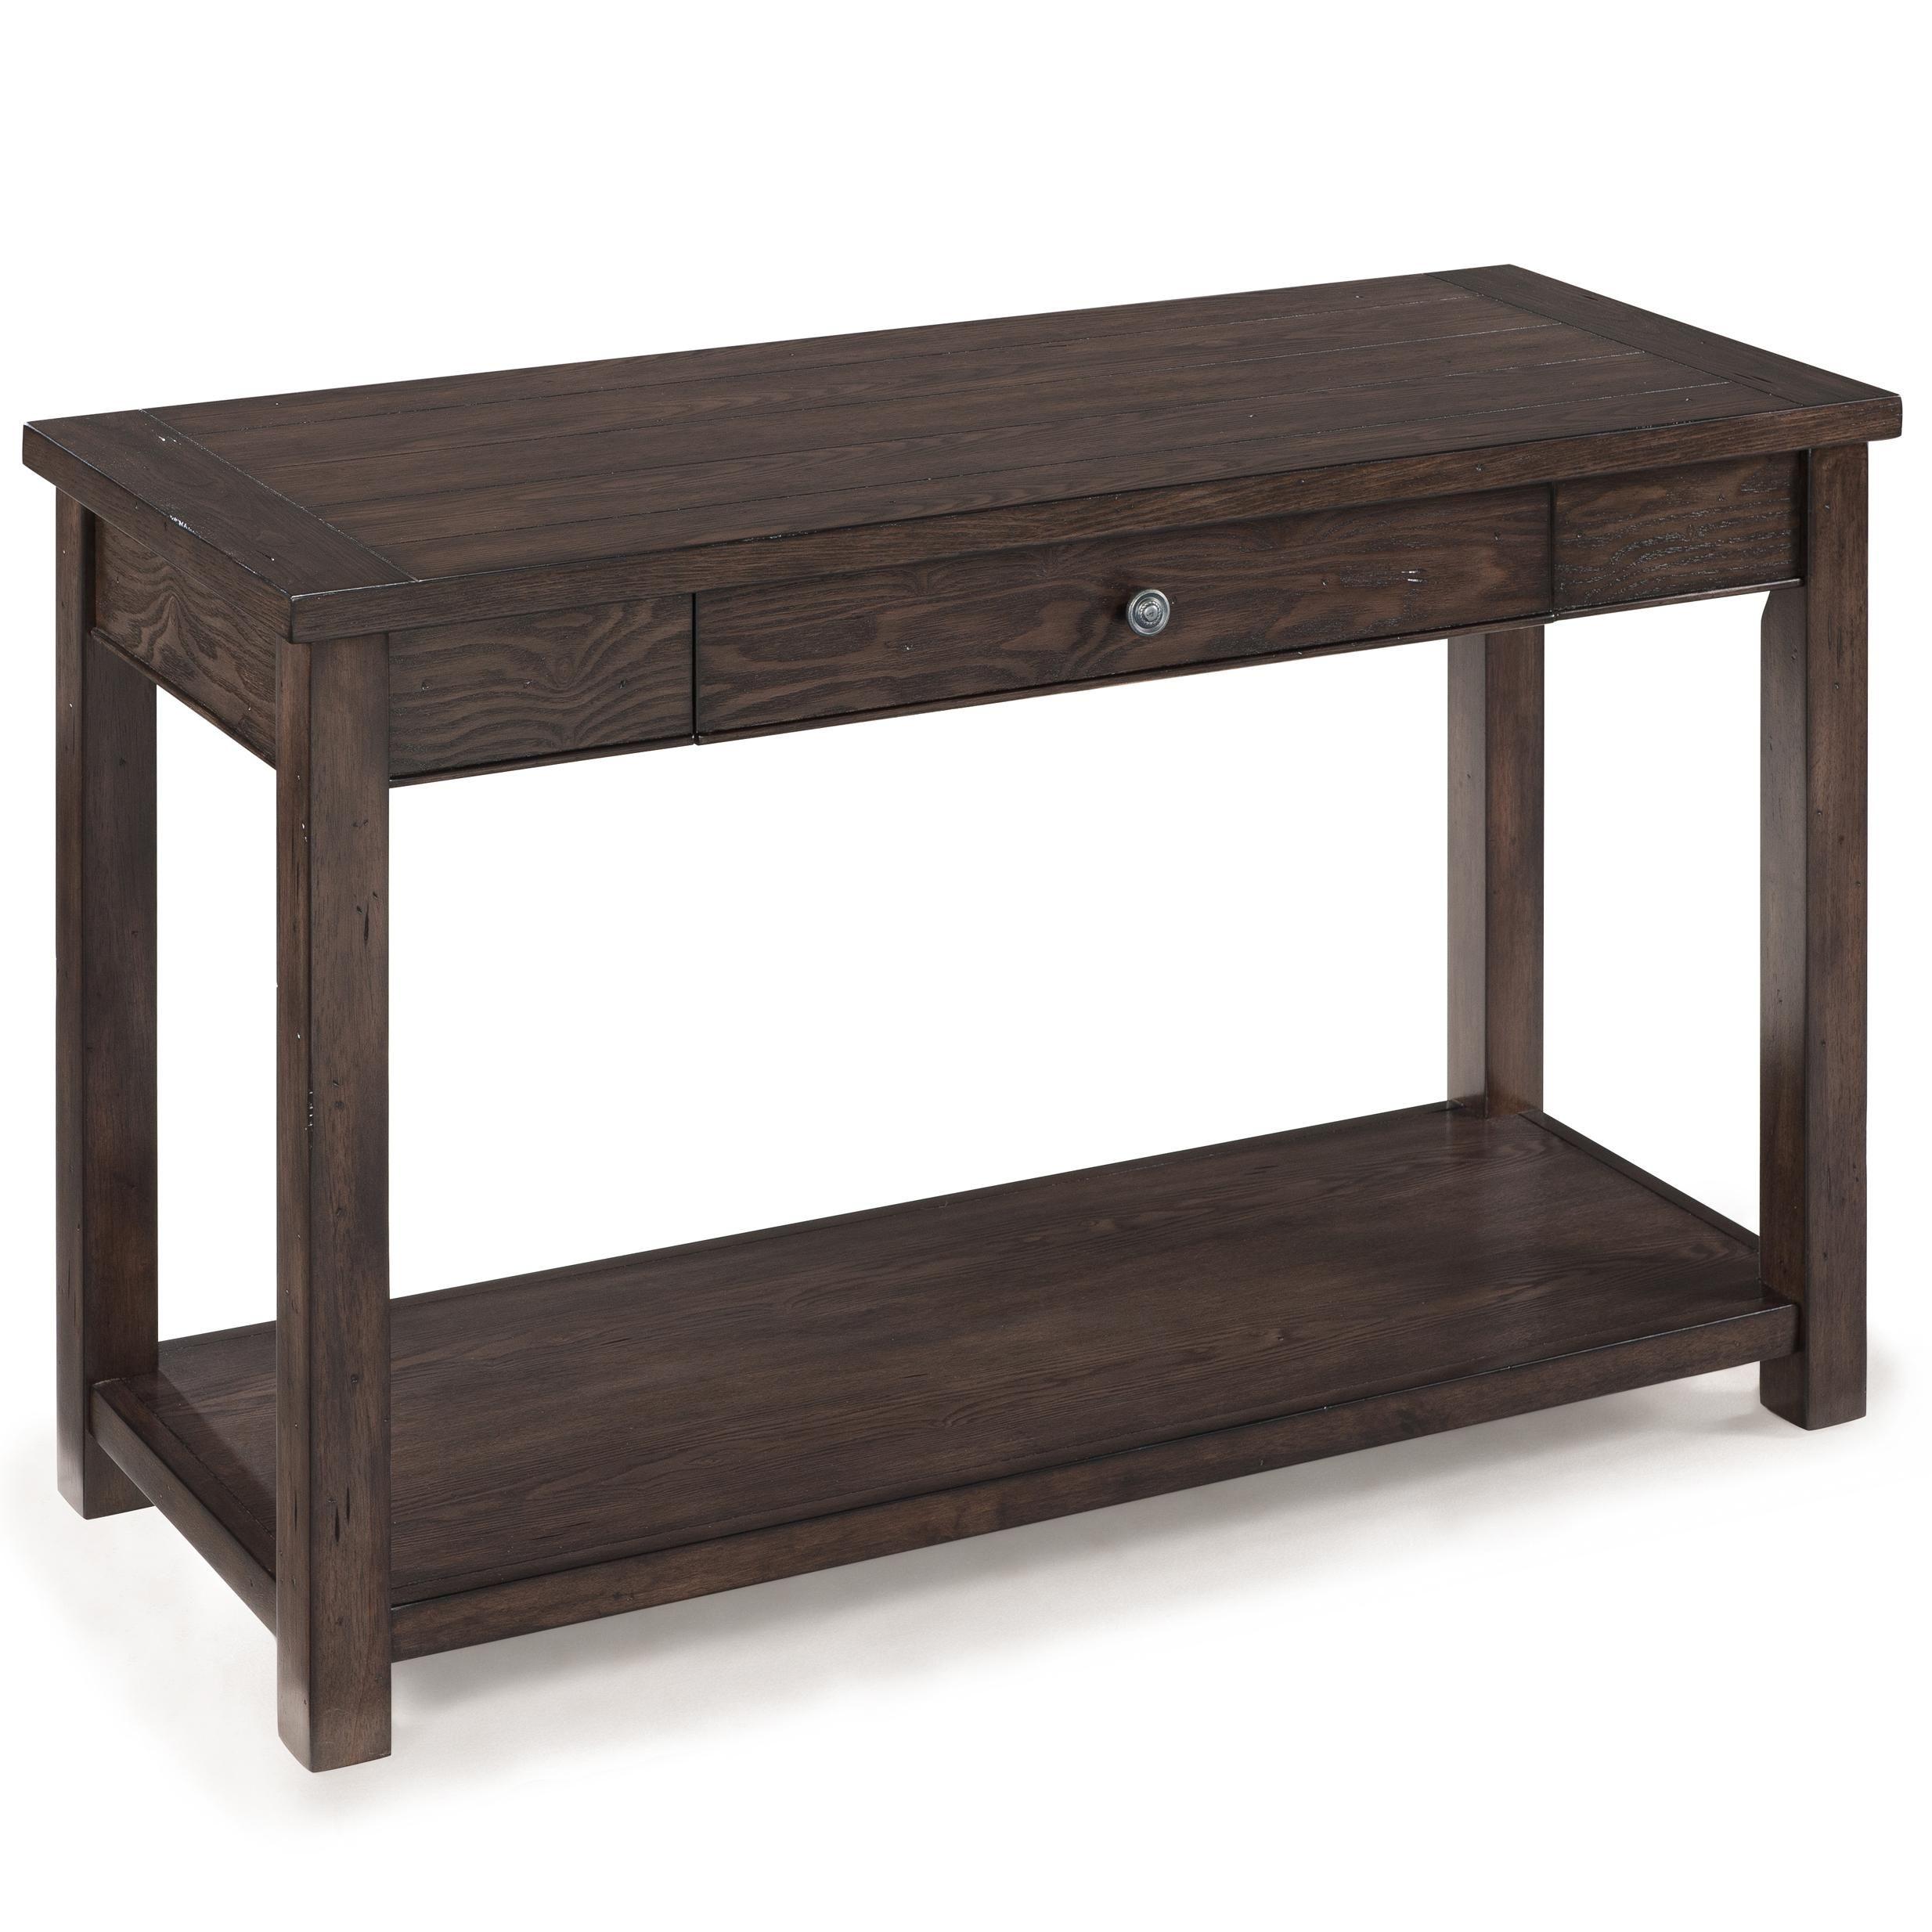 Sofa Sleeper Clayton Rectangular Sofa Table by Magnussen Home